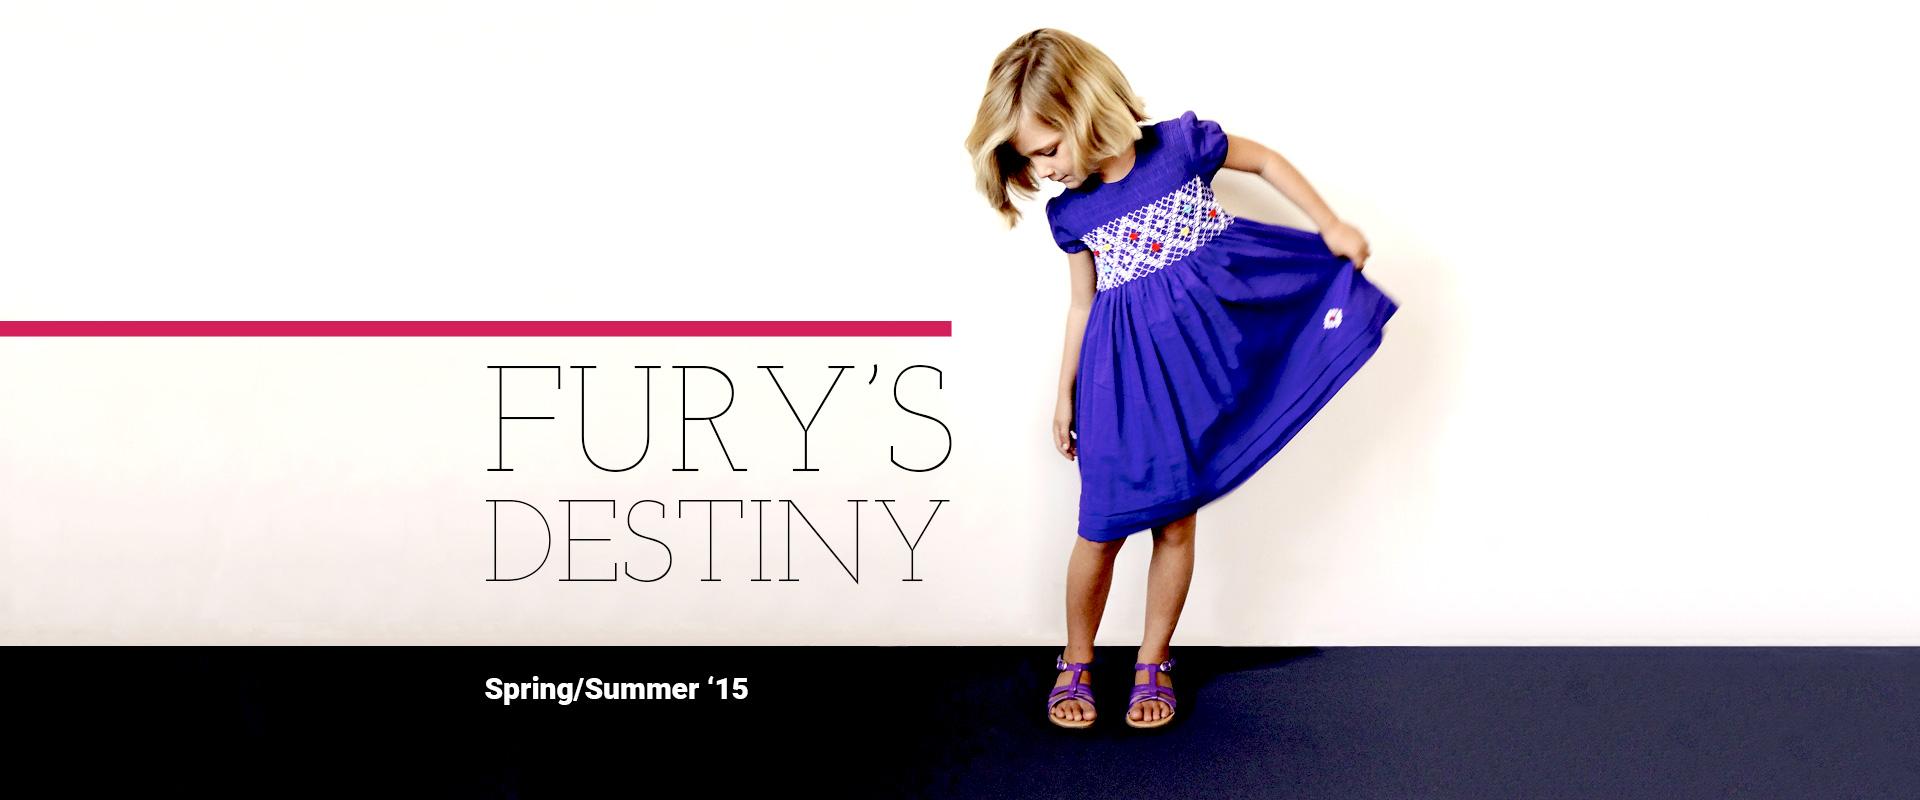 Titel: furys destiny